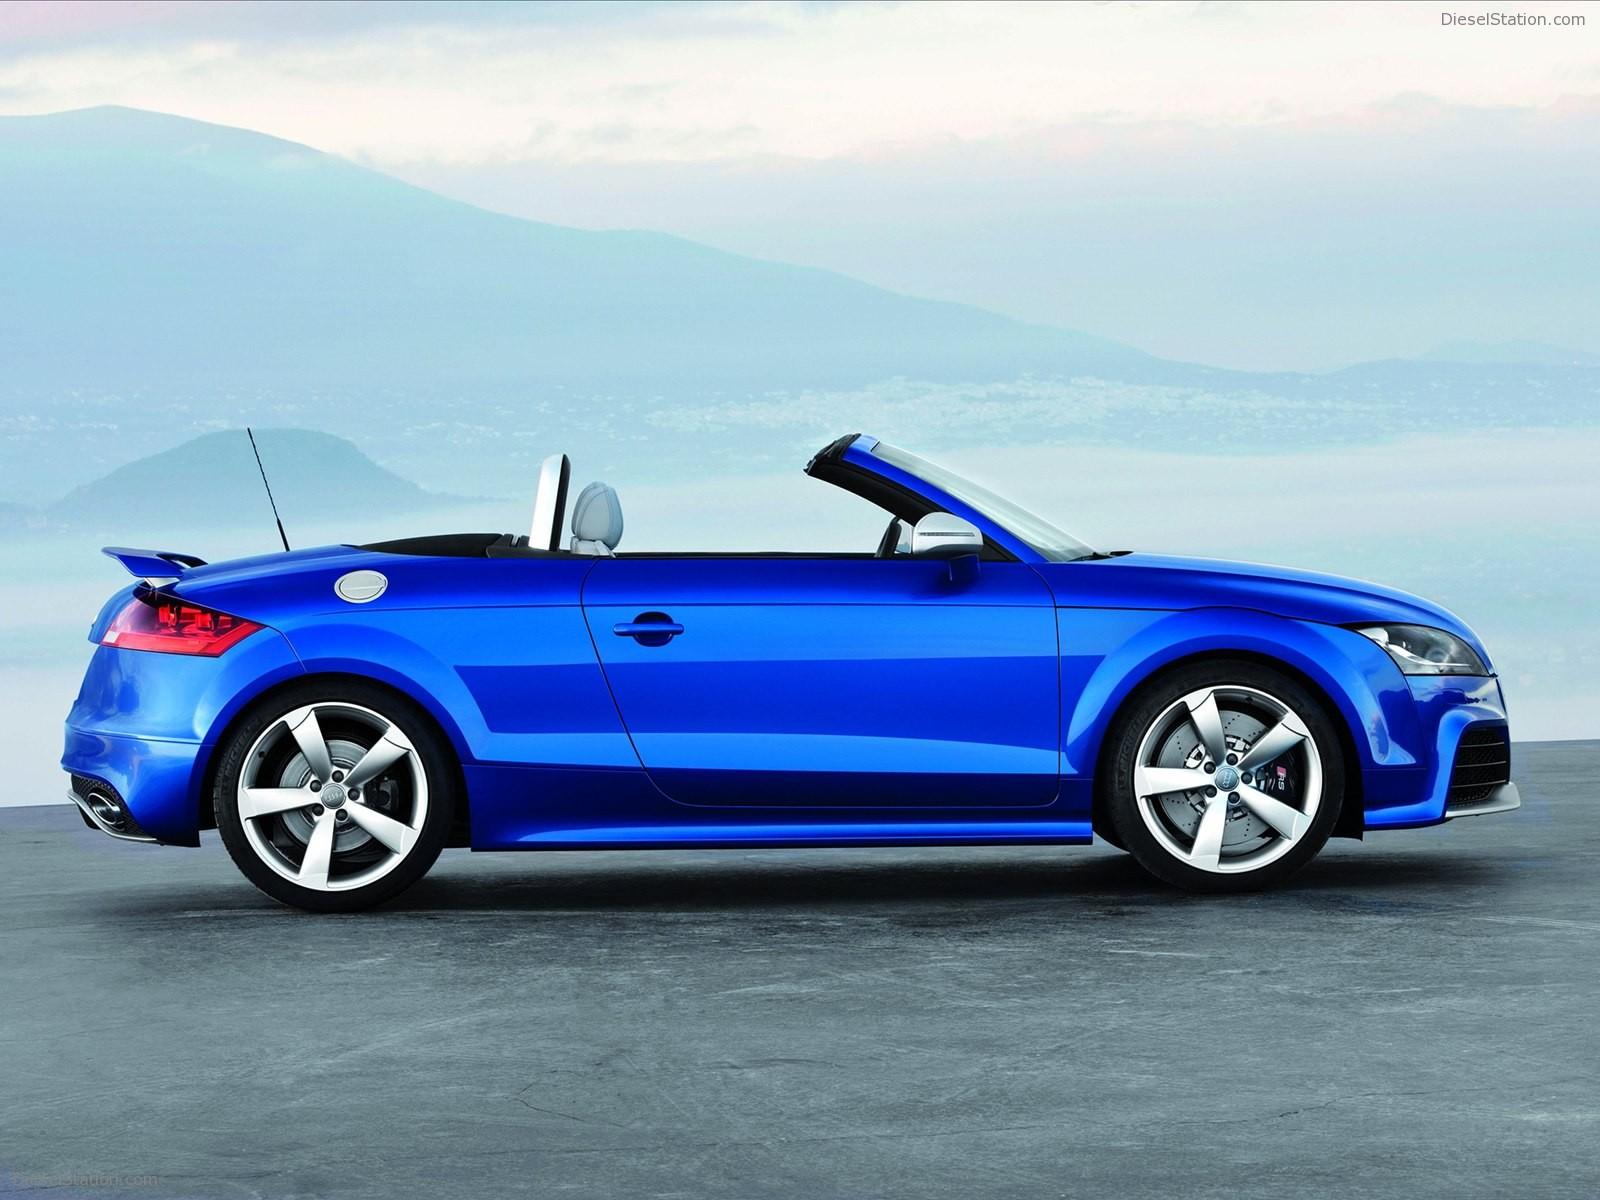 Audi TT RS 2012: Es un carro deportivo con un poderoso motor, un ...